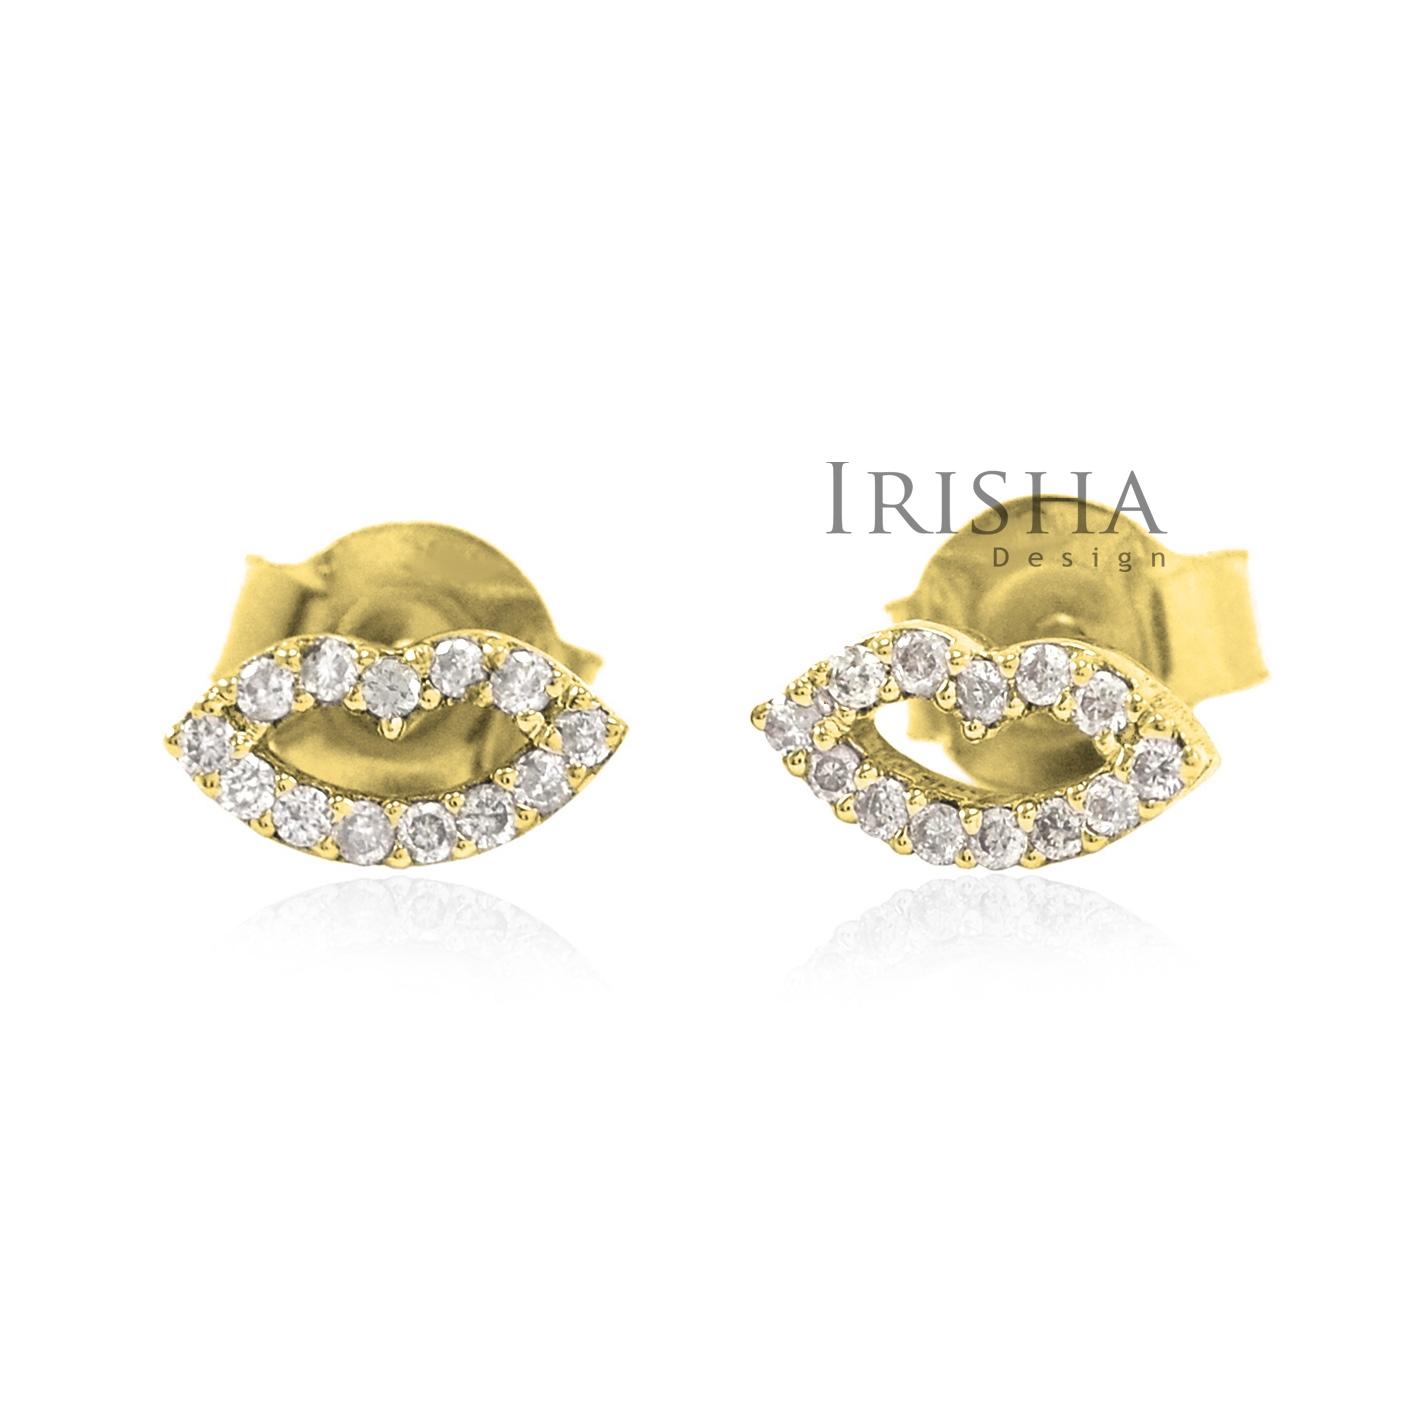 14K Gold 0.13 Ct. Genuine Diamond Lips Design Smile Studs Earrings Fine Jewelry